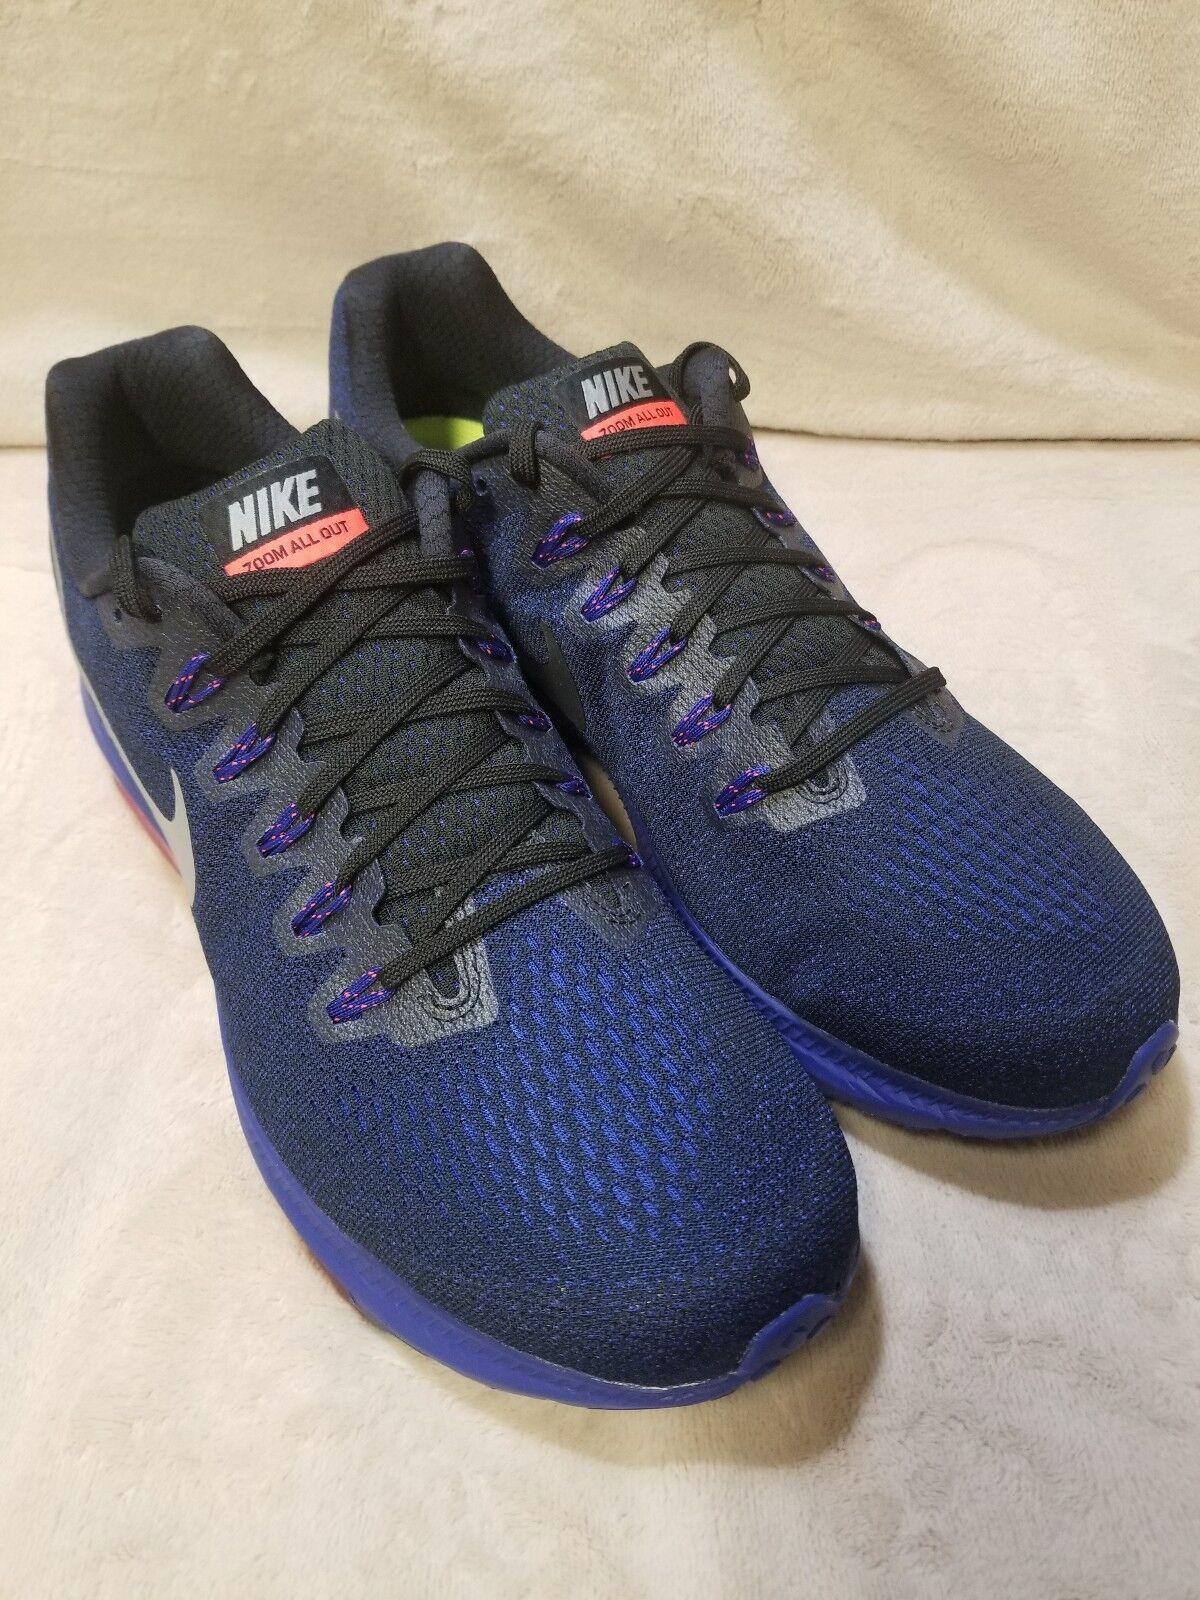 Nike air jordan retrò 17 xvii basso solefly fulmine fulmine fulmine nero alternativo numero 15 s 1c97db